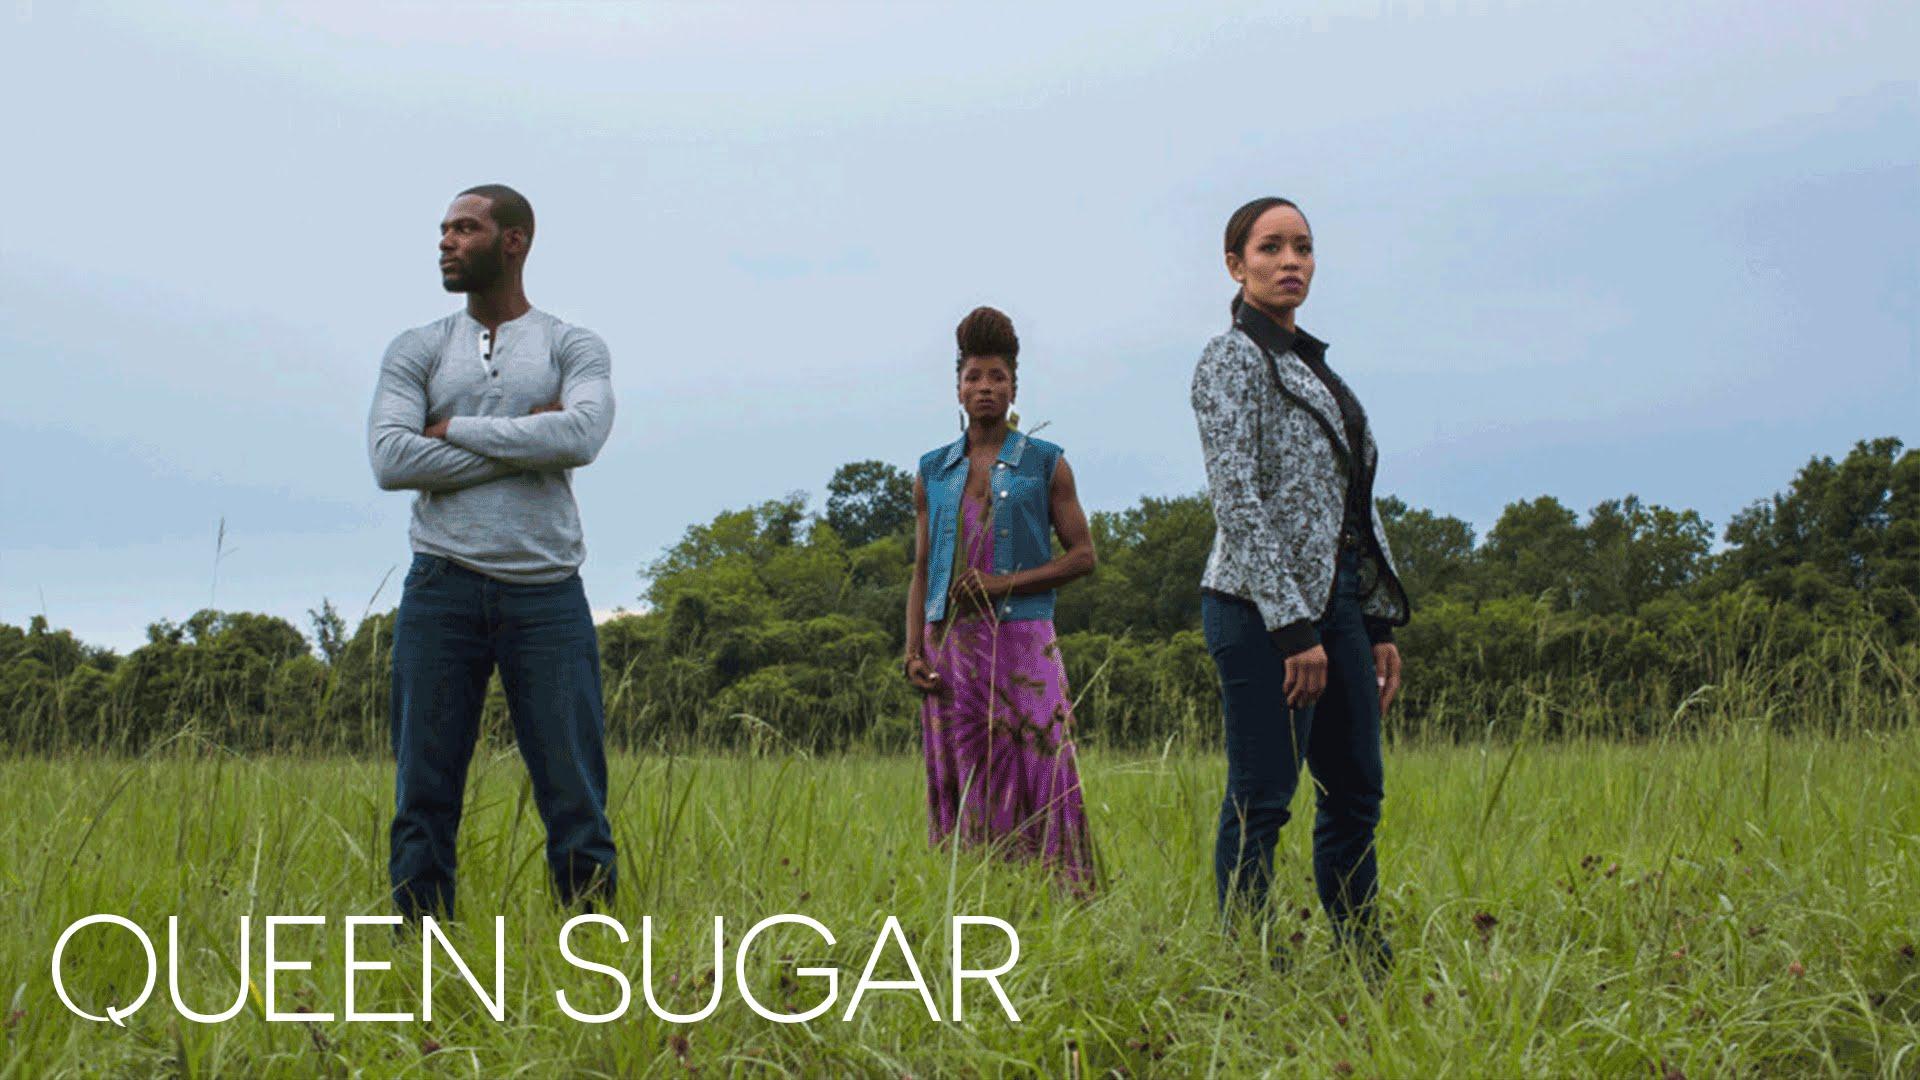 Queen Sugar Season 1 Promo 1